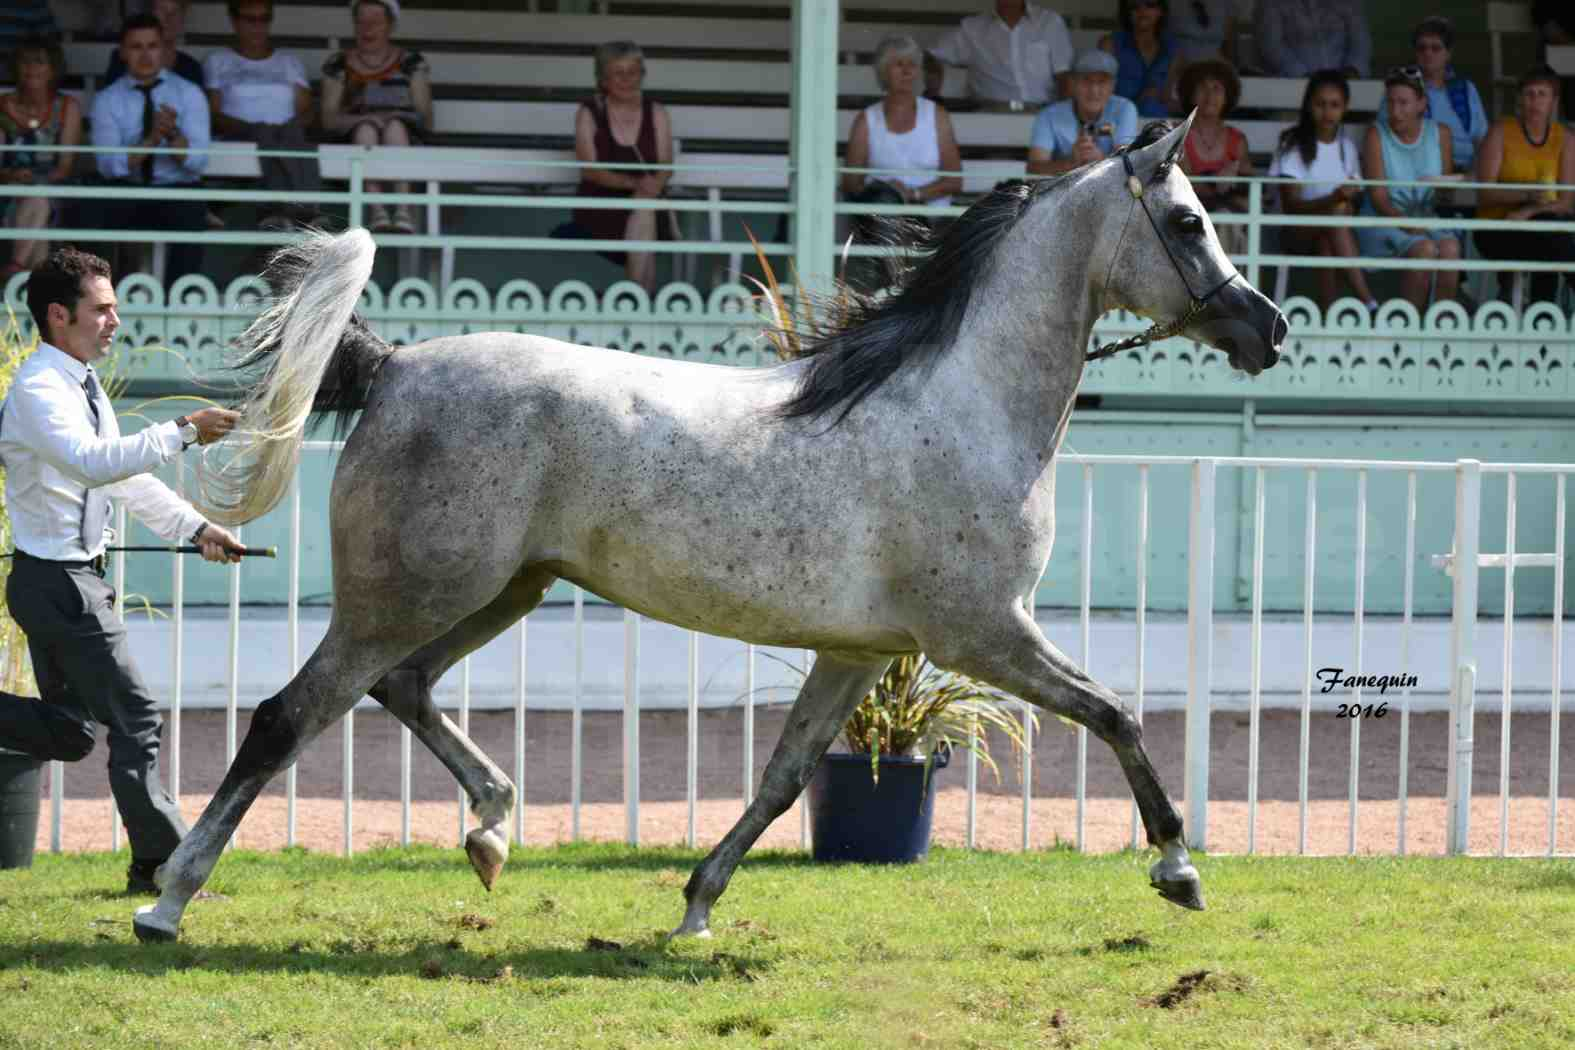 International Arabian Horse Show B de VICHY 2016 - ISABELLA - Notre Sélection - 07